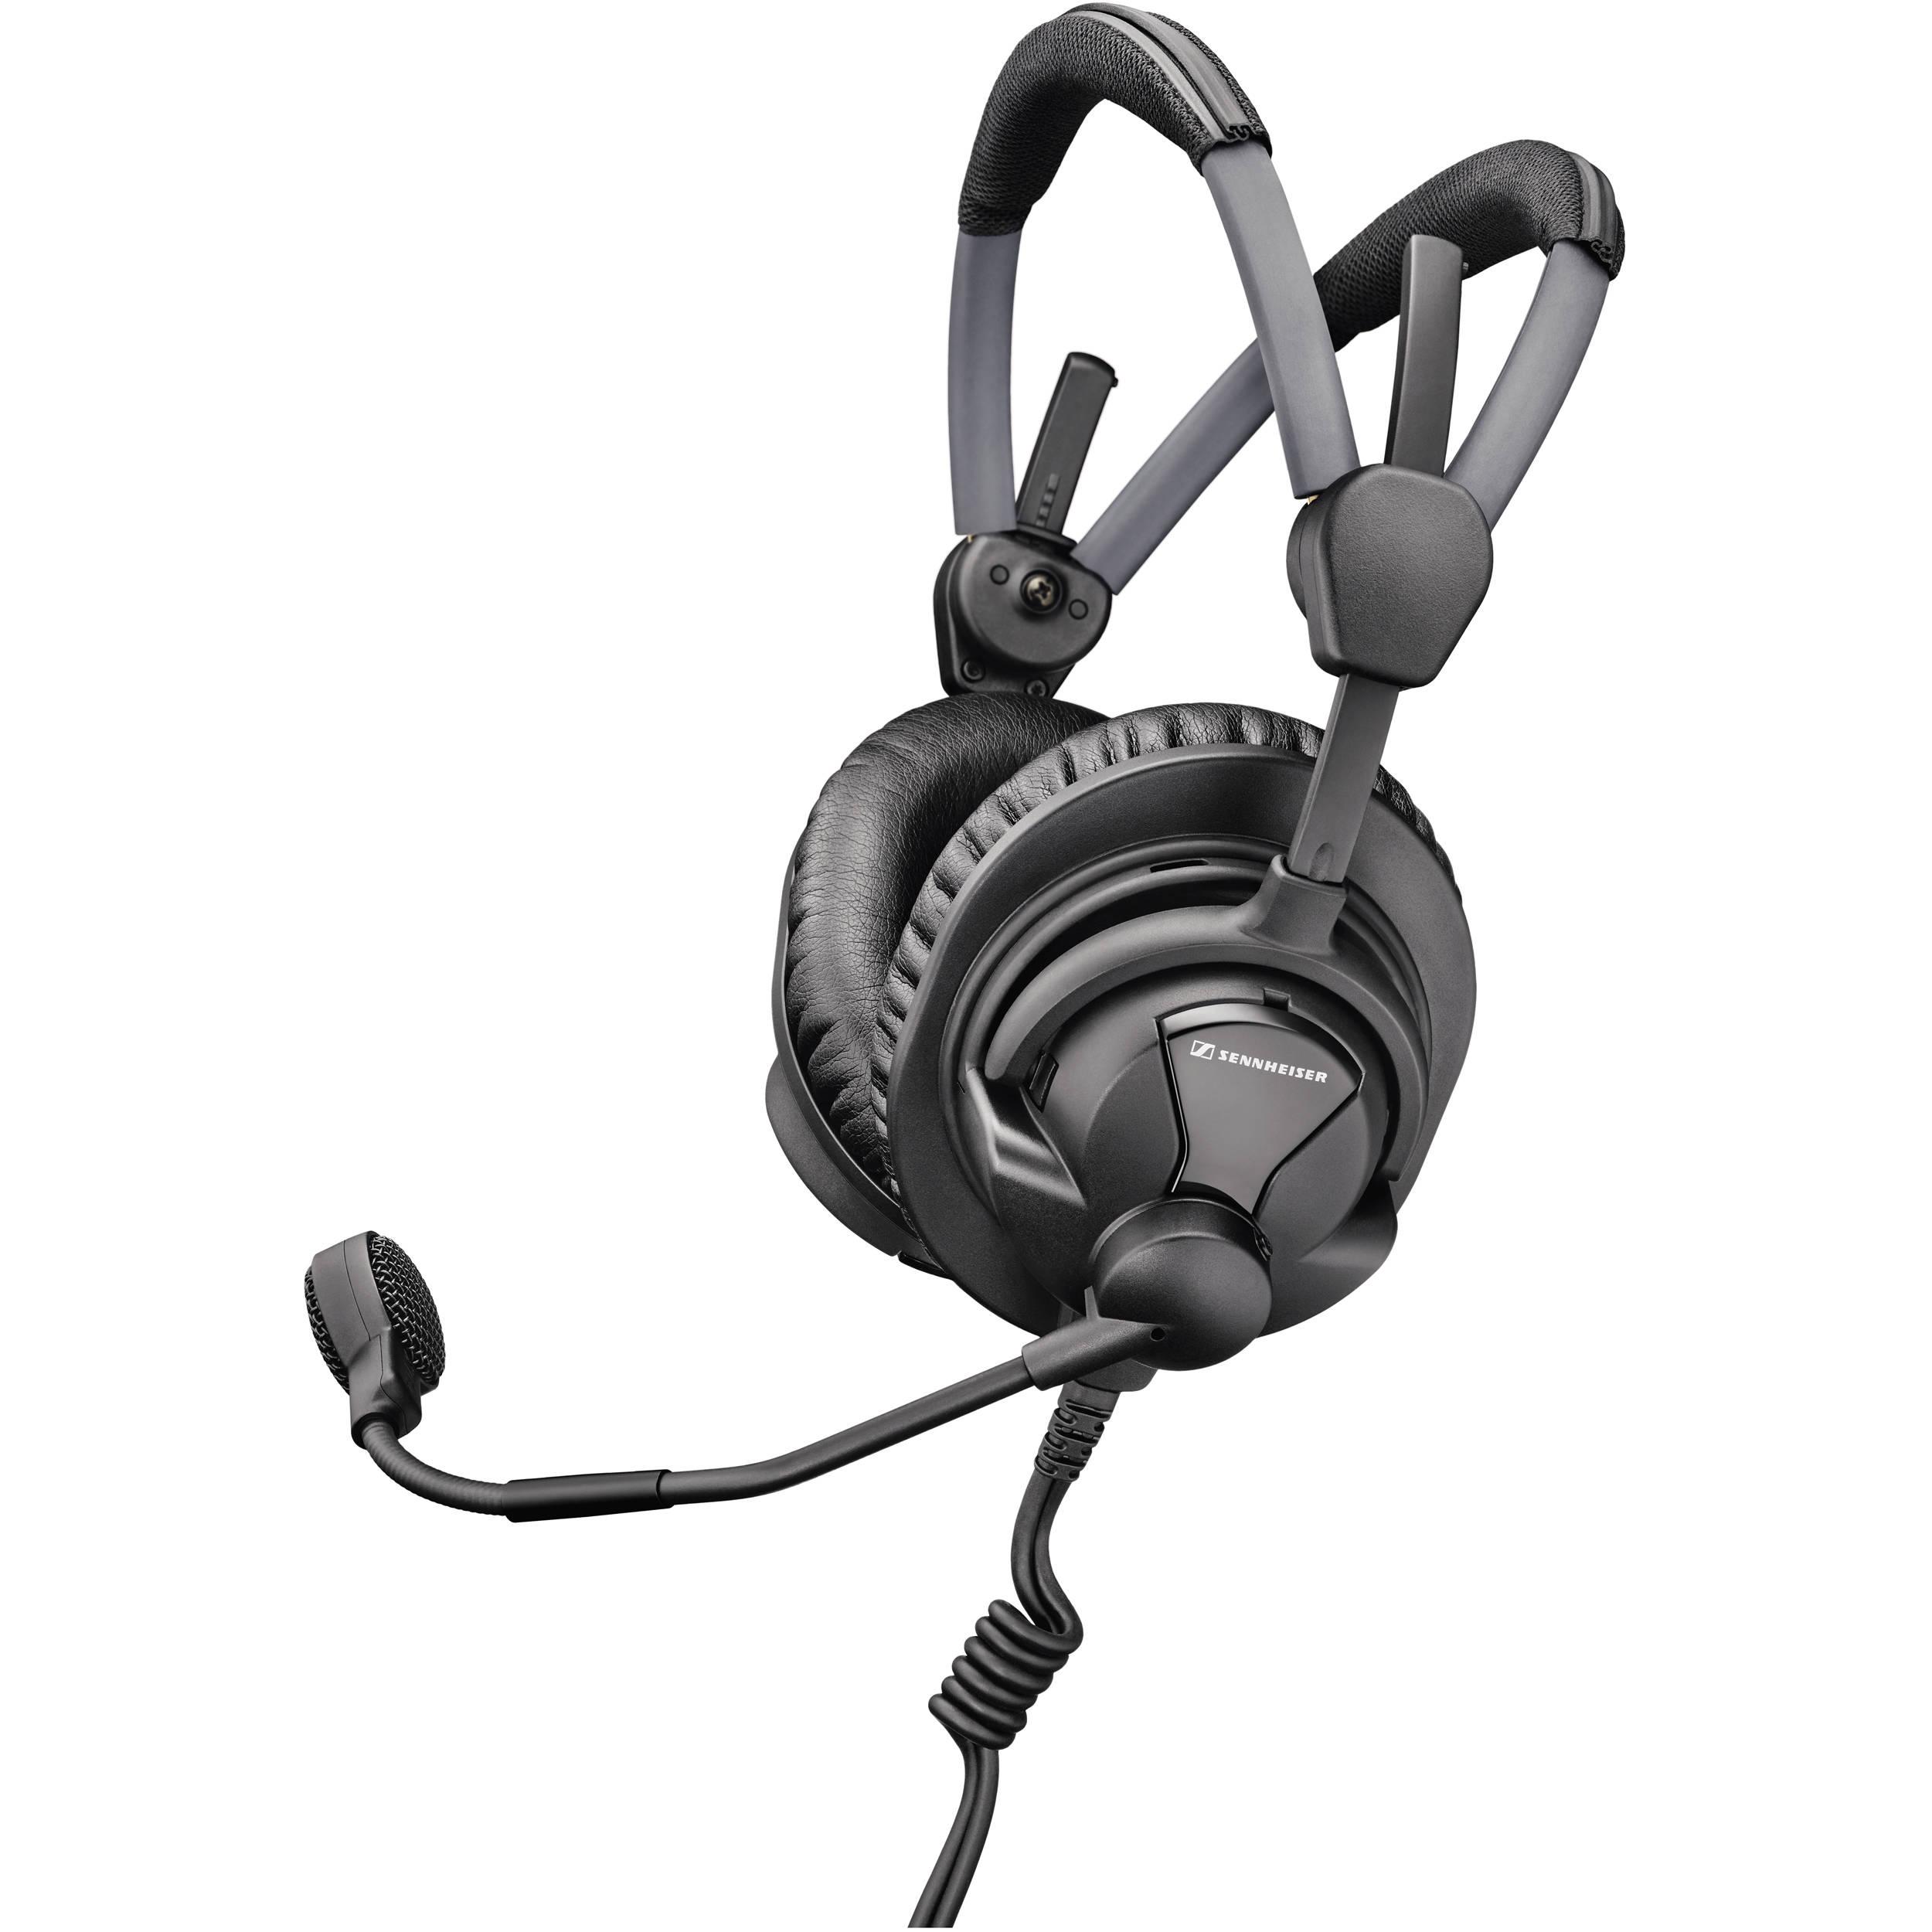 168f1e69b6f Sennheiser HMD 27 Professional Broadcast Headset (No Cable)